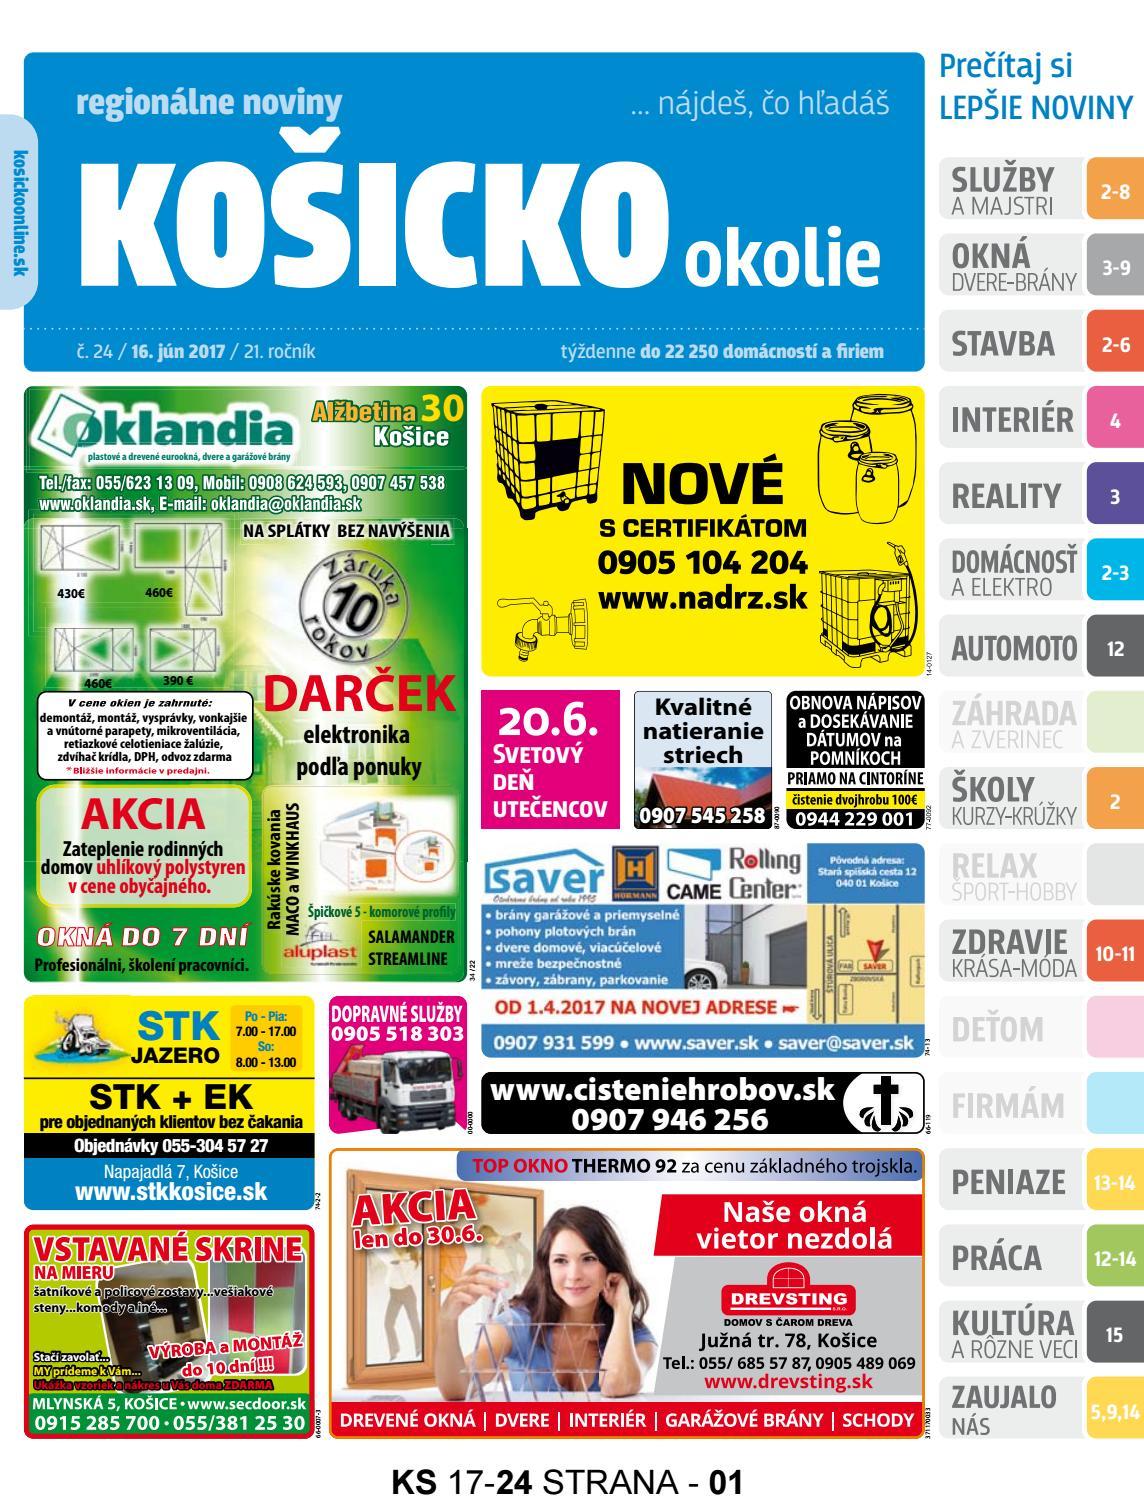 motúzov Online Zoznamka